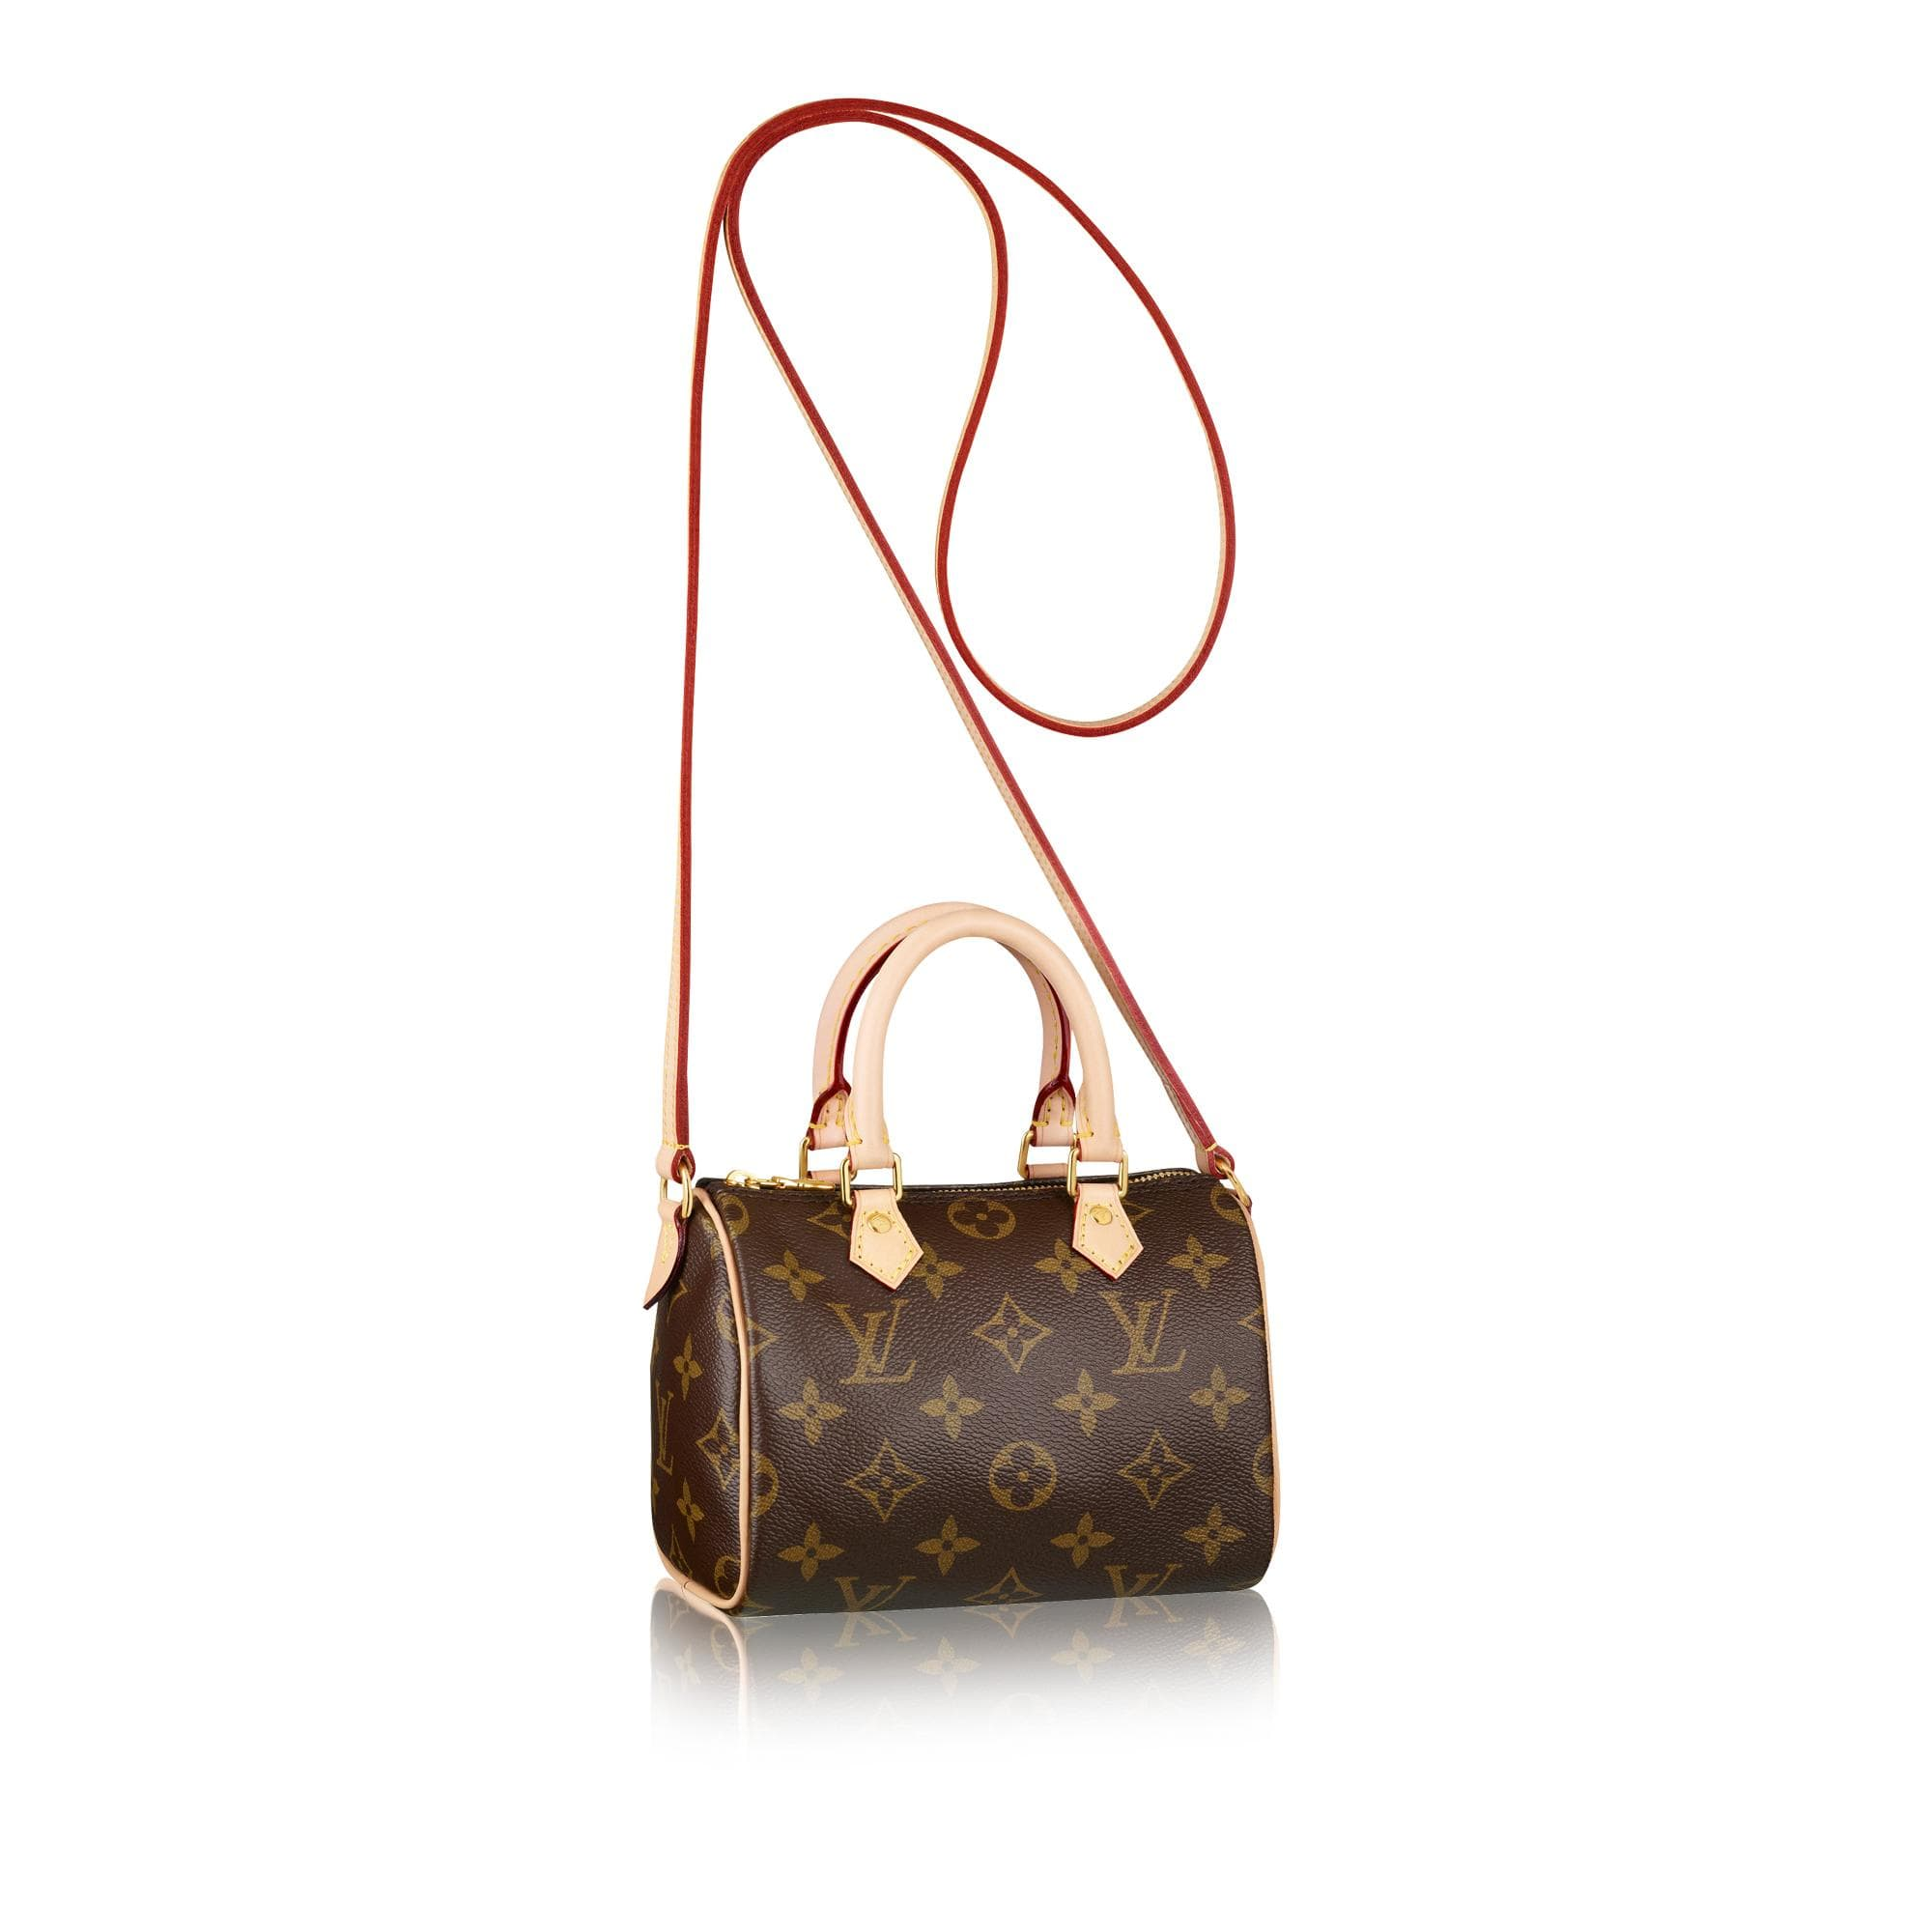 Louis Vuitton NANO SPEEDY BAG - $1,100